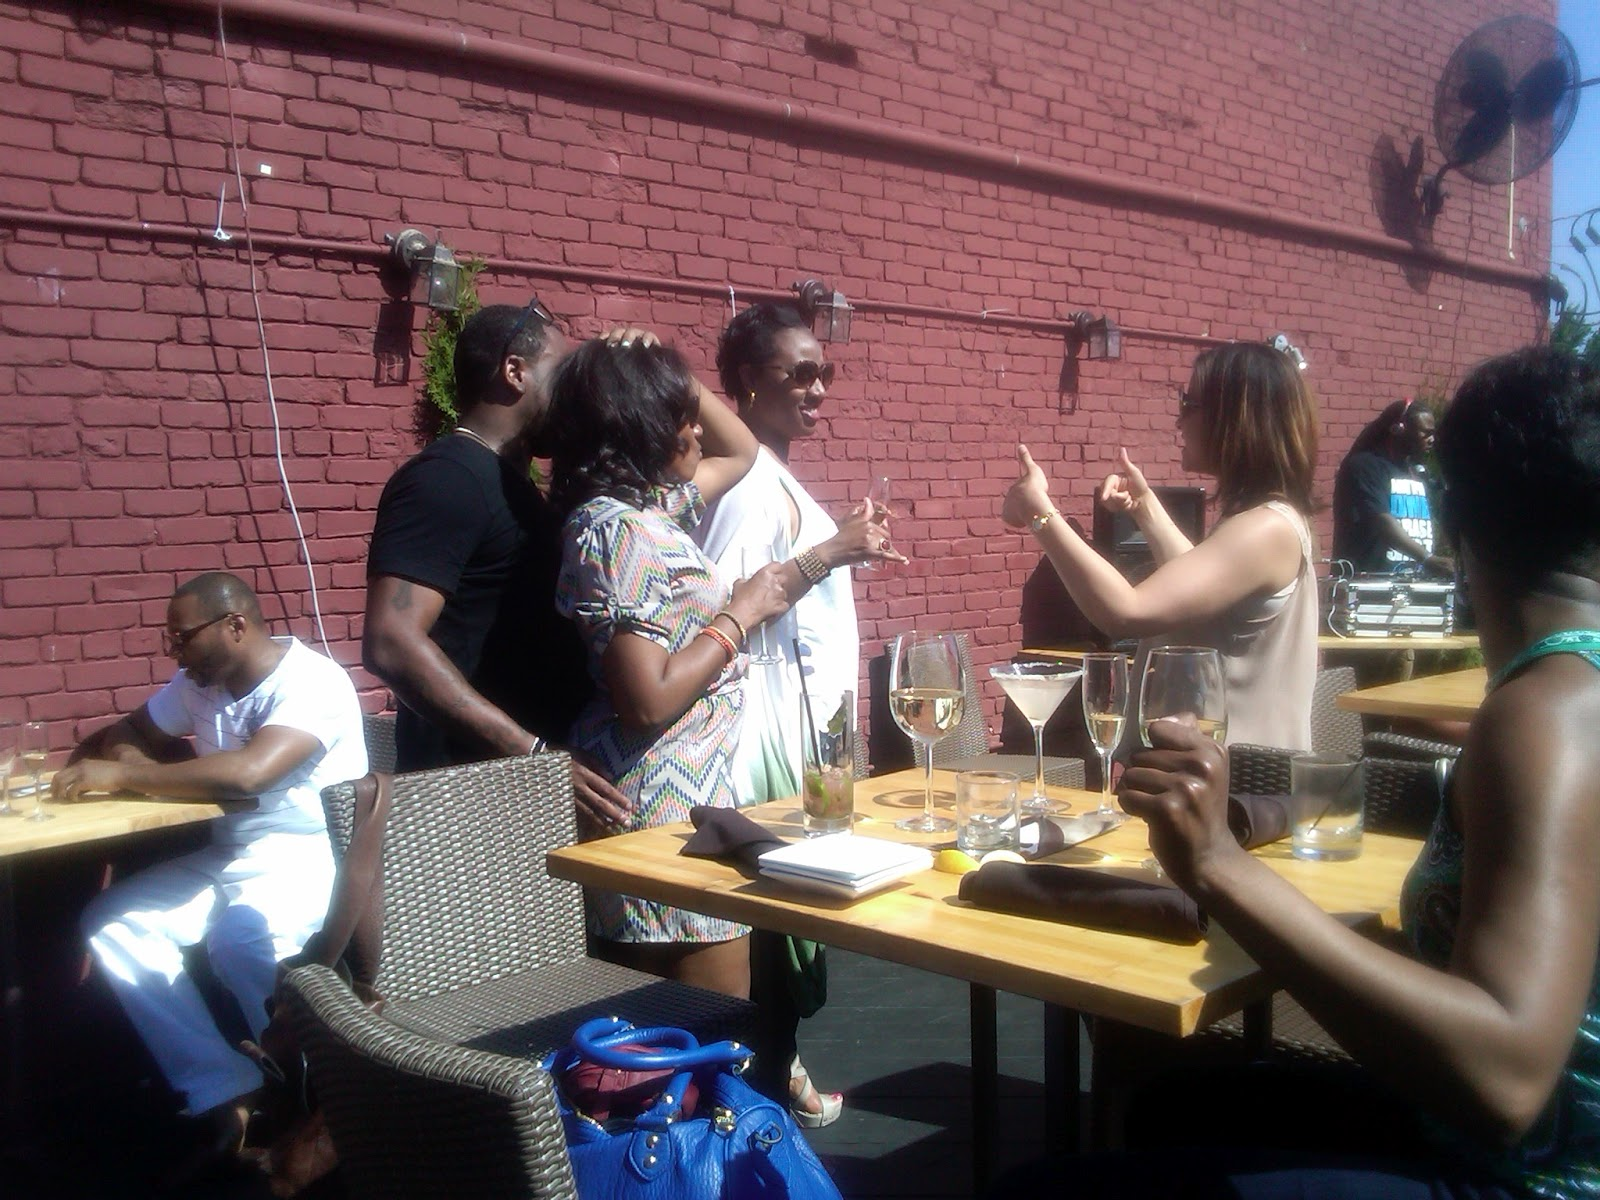 Lounge Around Atlanta Fm2 S First Day Party Cafe Circa